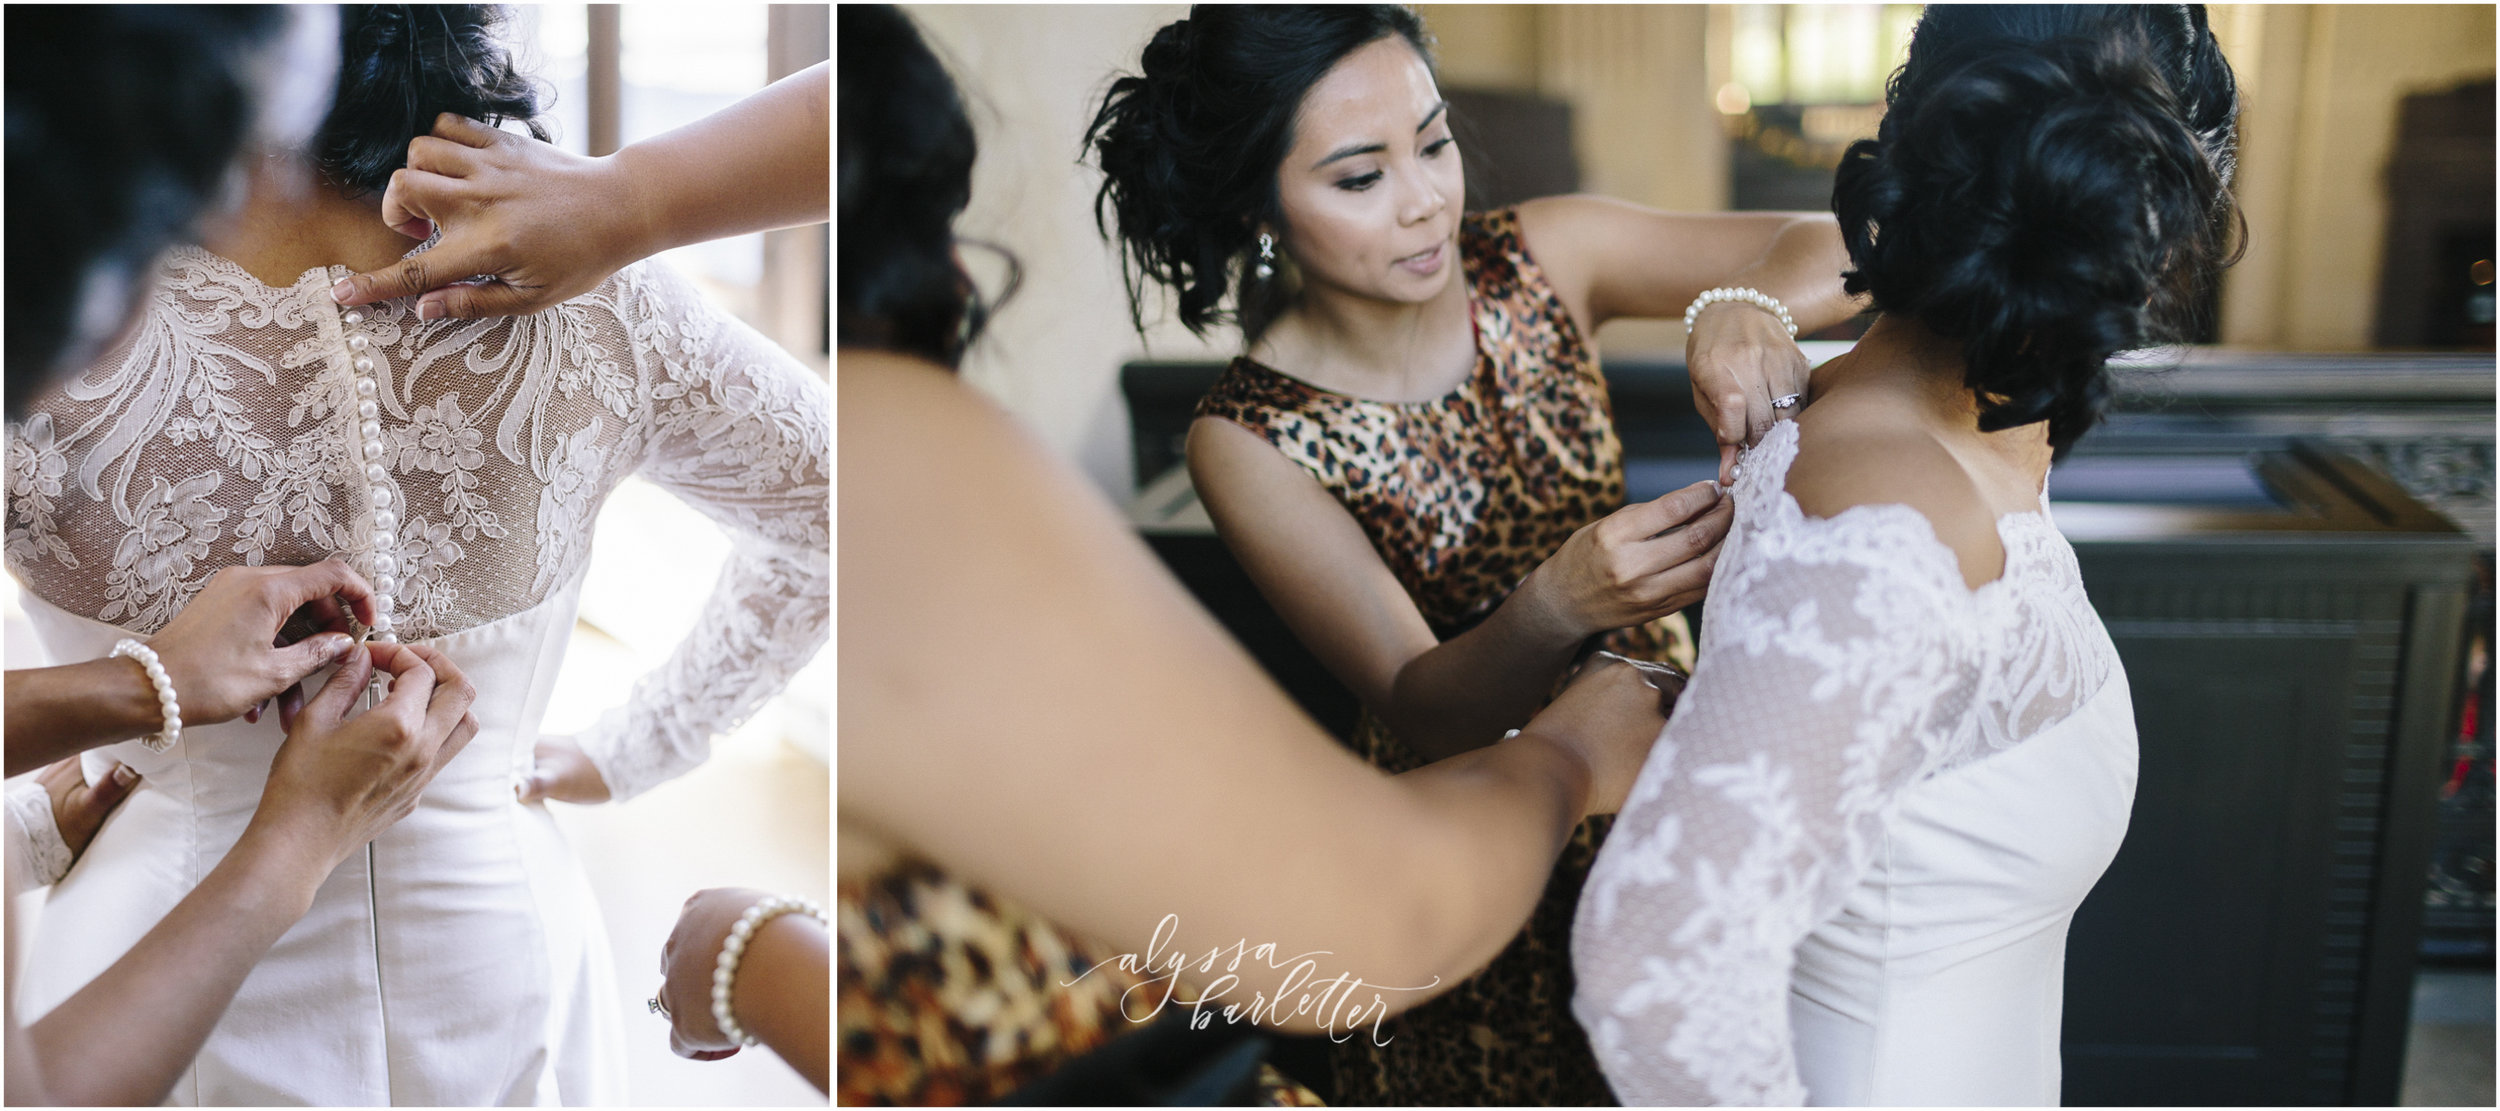 alyssa barletter photography union station wedding photos leopard print winter wedding-1-8.jpg